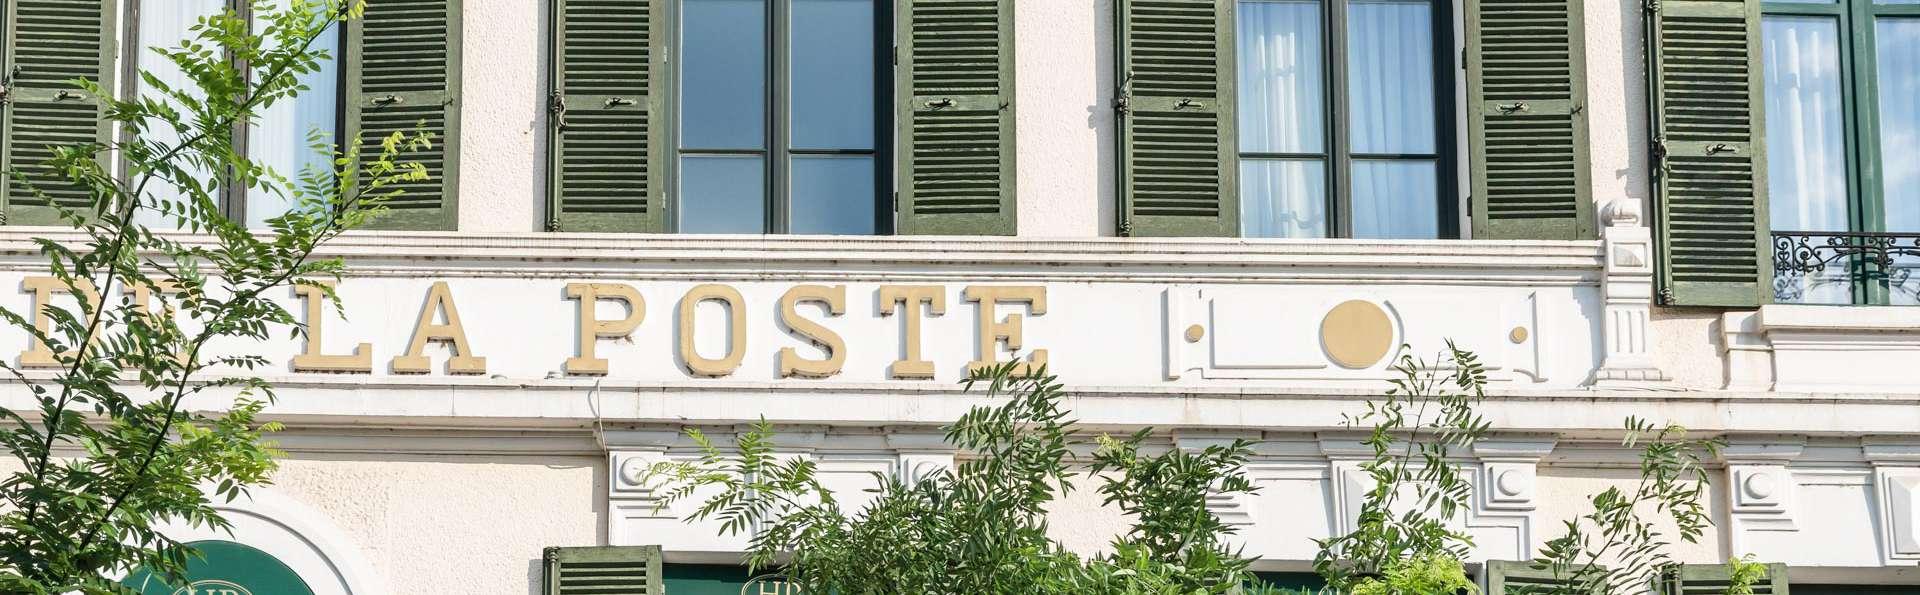 Najeti Hôtel de la Poste  - EDIT_FRONT_01.jpg